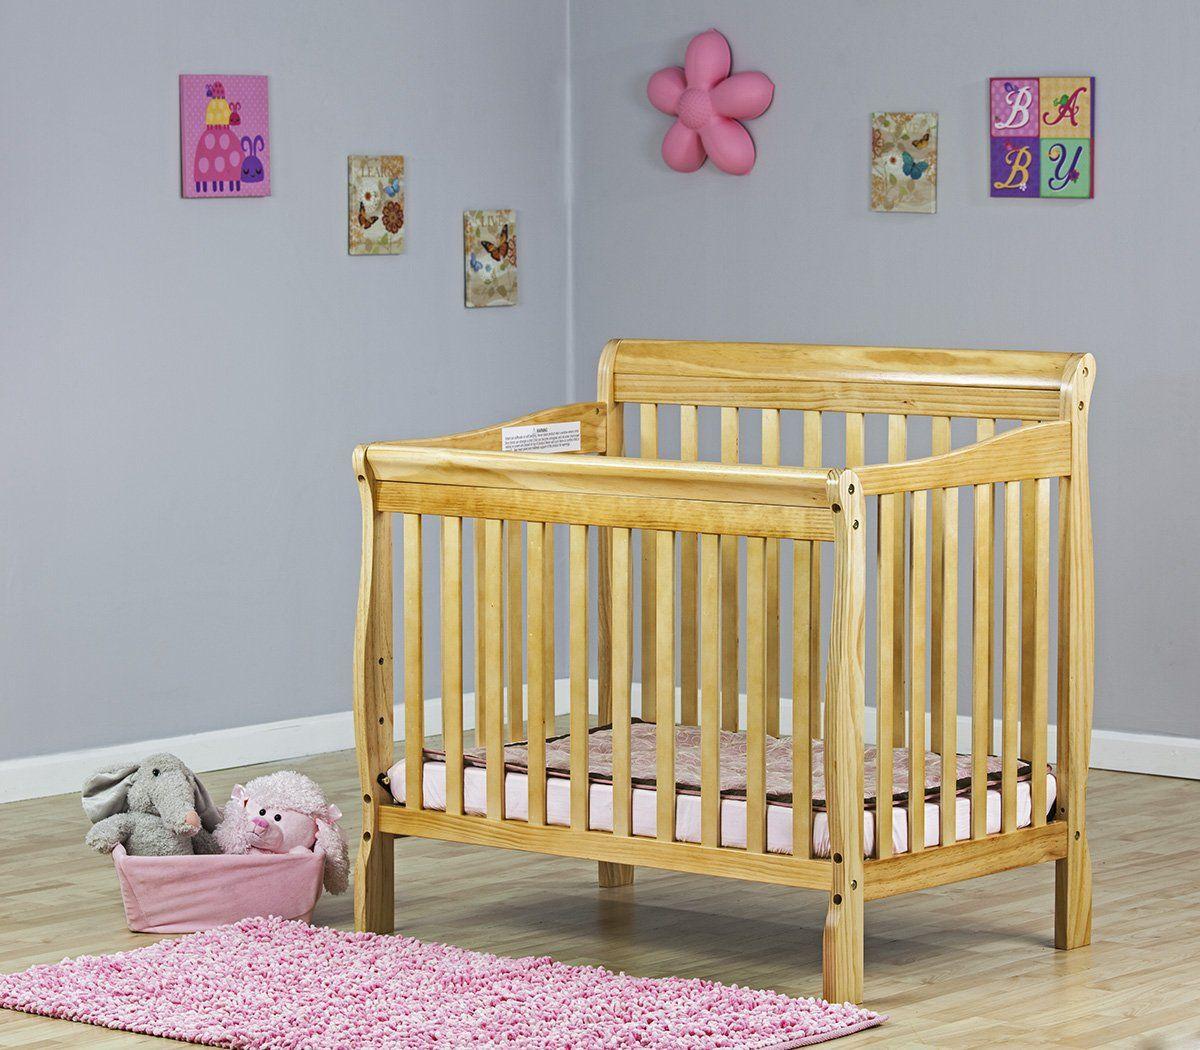 Amazon Com Dream On Me 4 In 1 Aden Convertible Mini Crib Black Baby Crib Baby Cribs For Small Spaces Cribs Best Crib